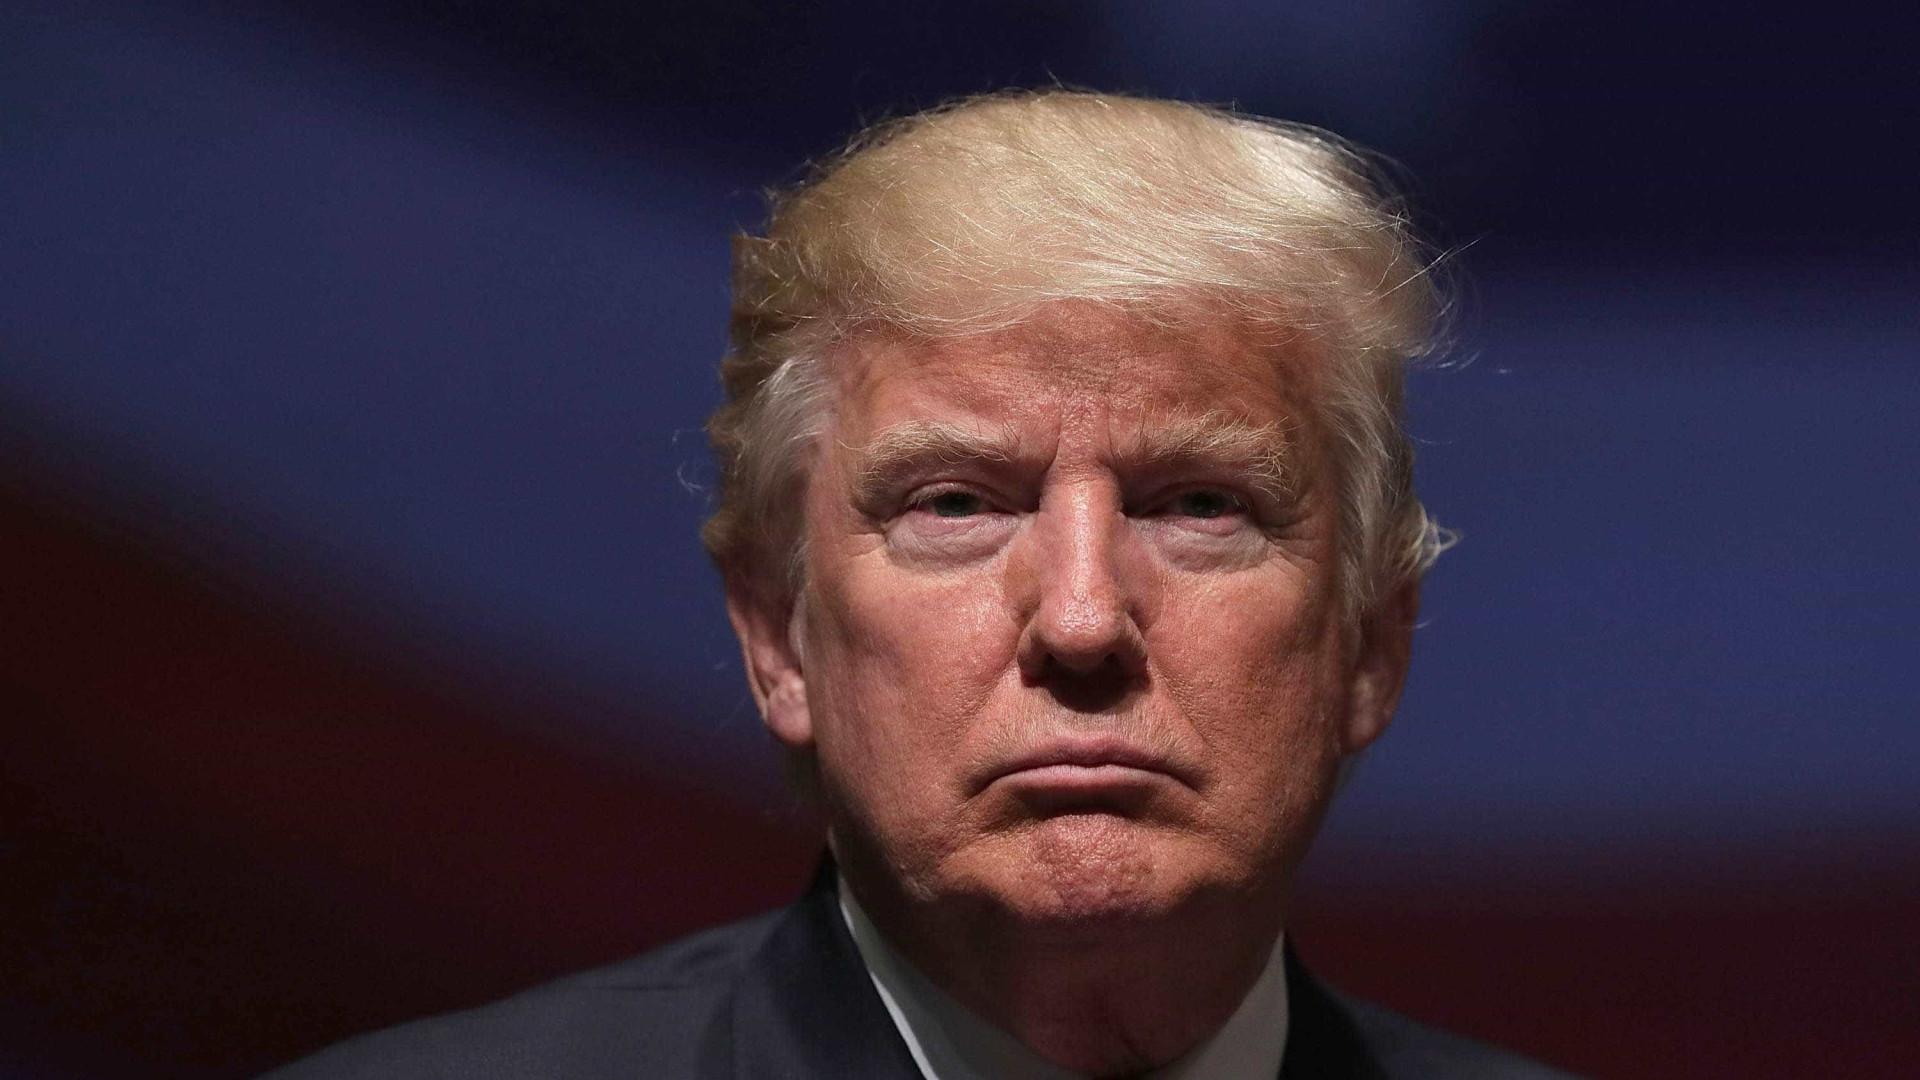 Portugueses prevêem impacto negativo com Trump a liderar EUA